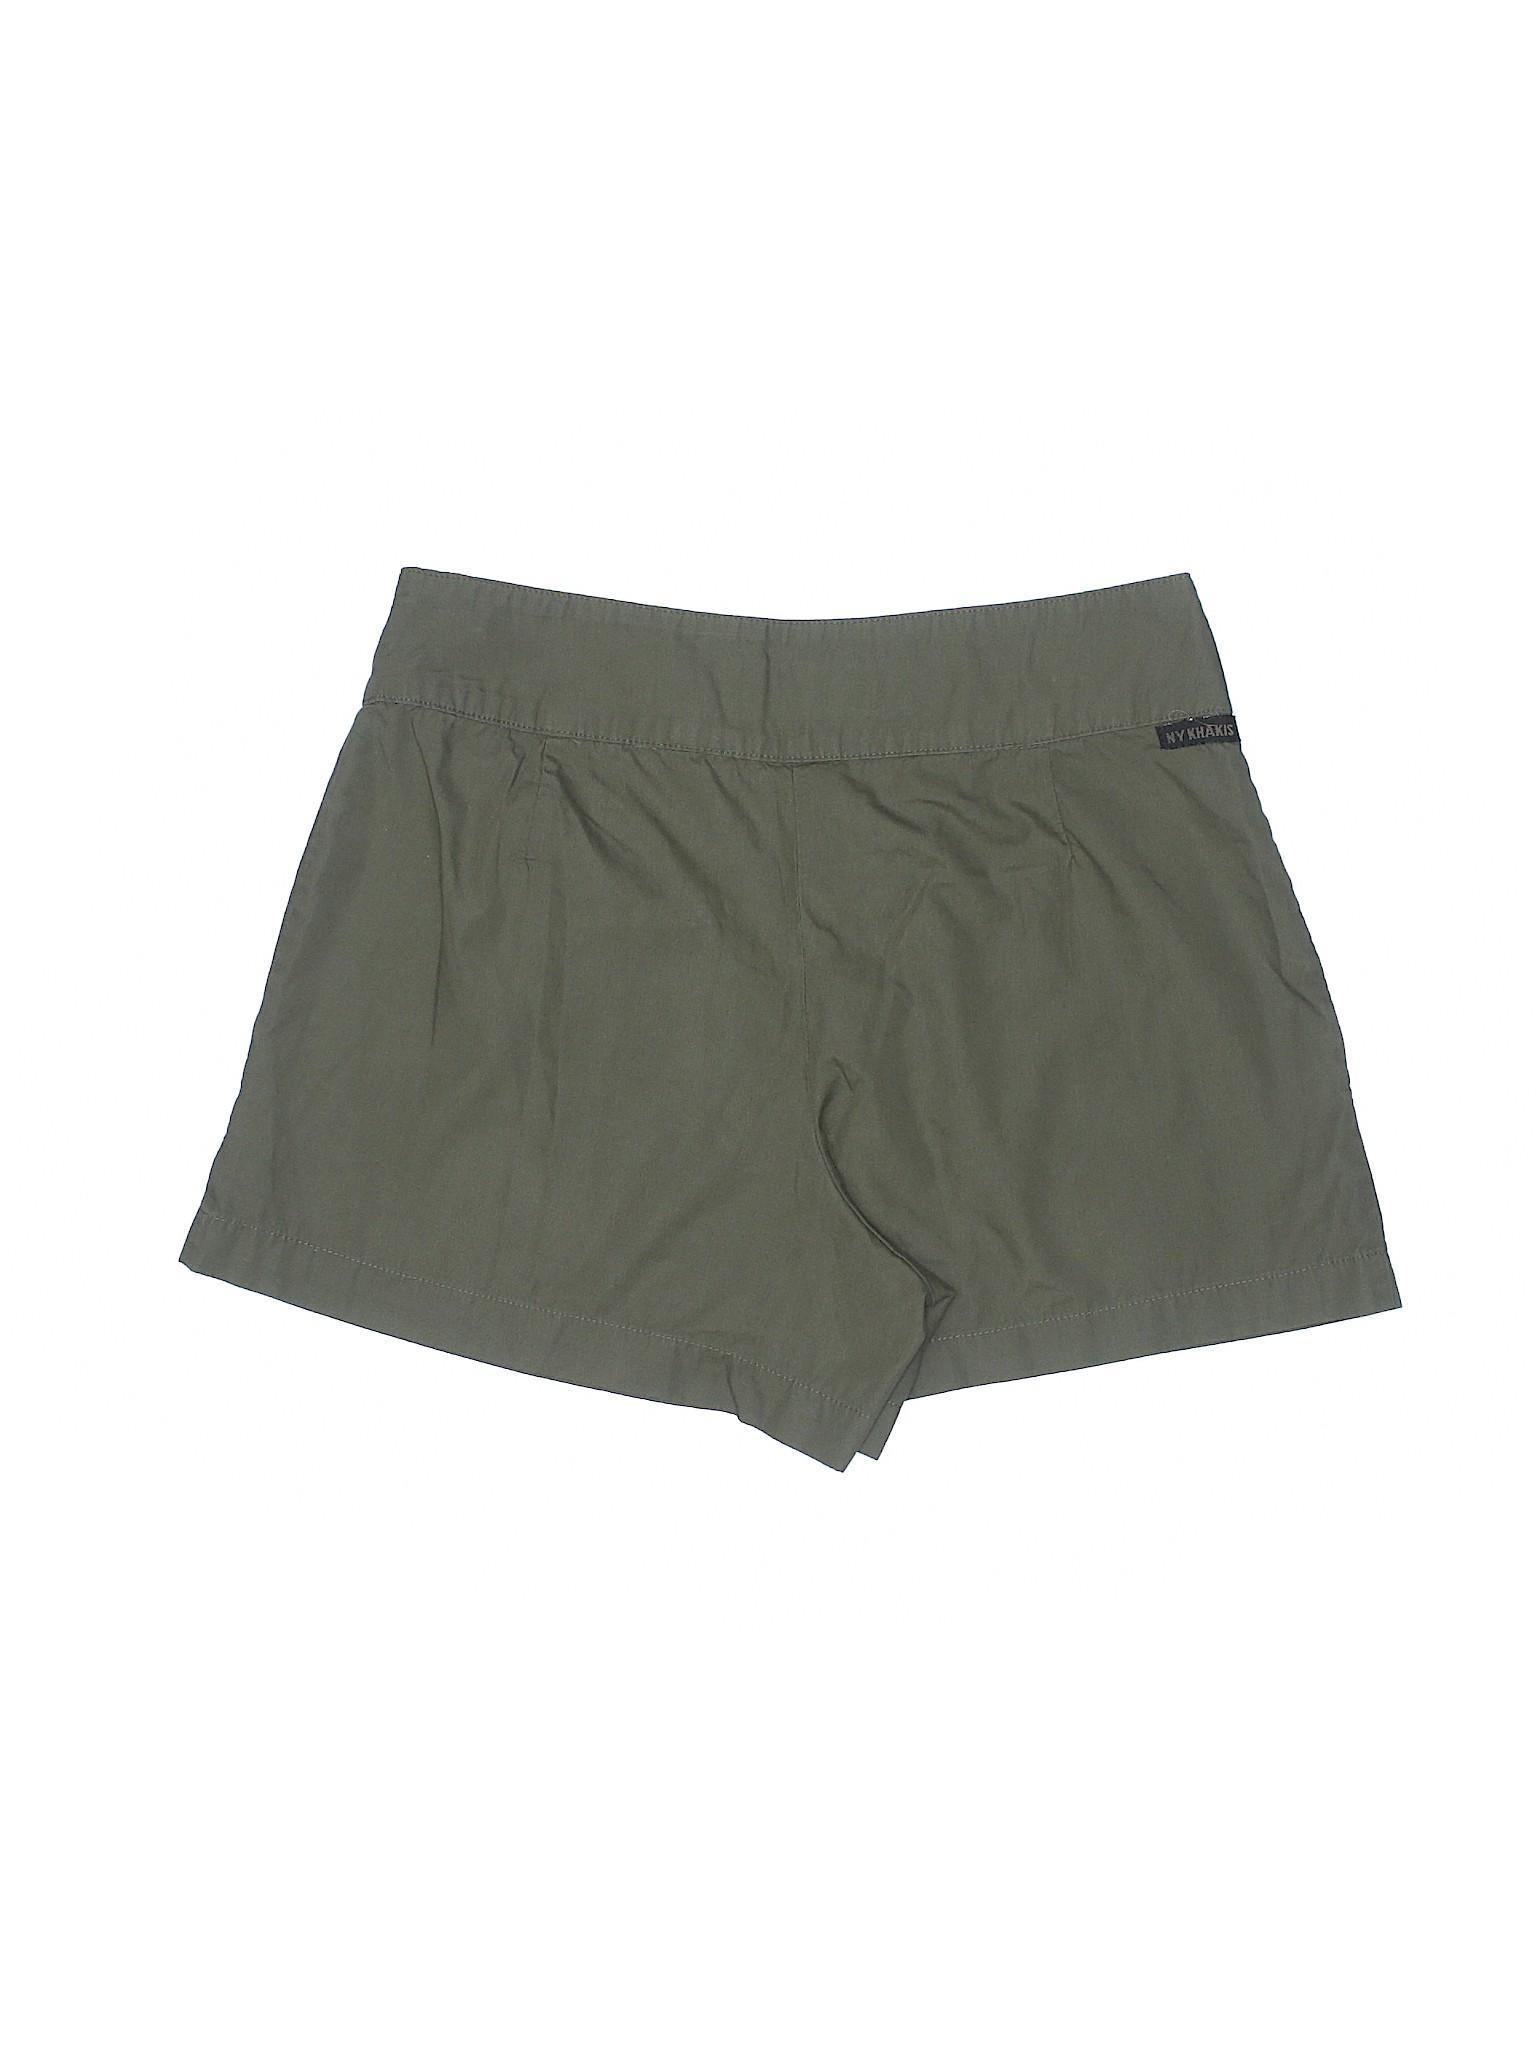 Boutique Company New amp; Khaki Shorts York p0xUq0fwv